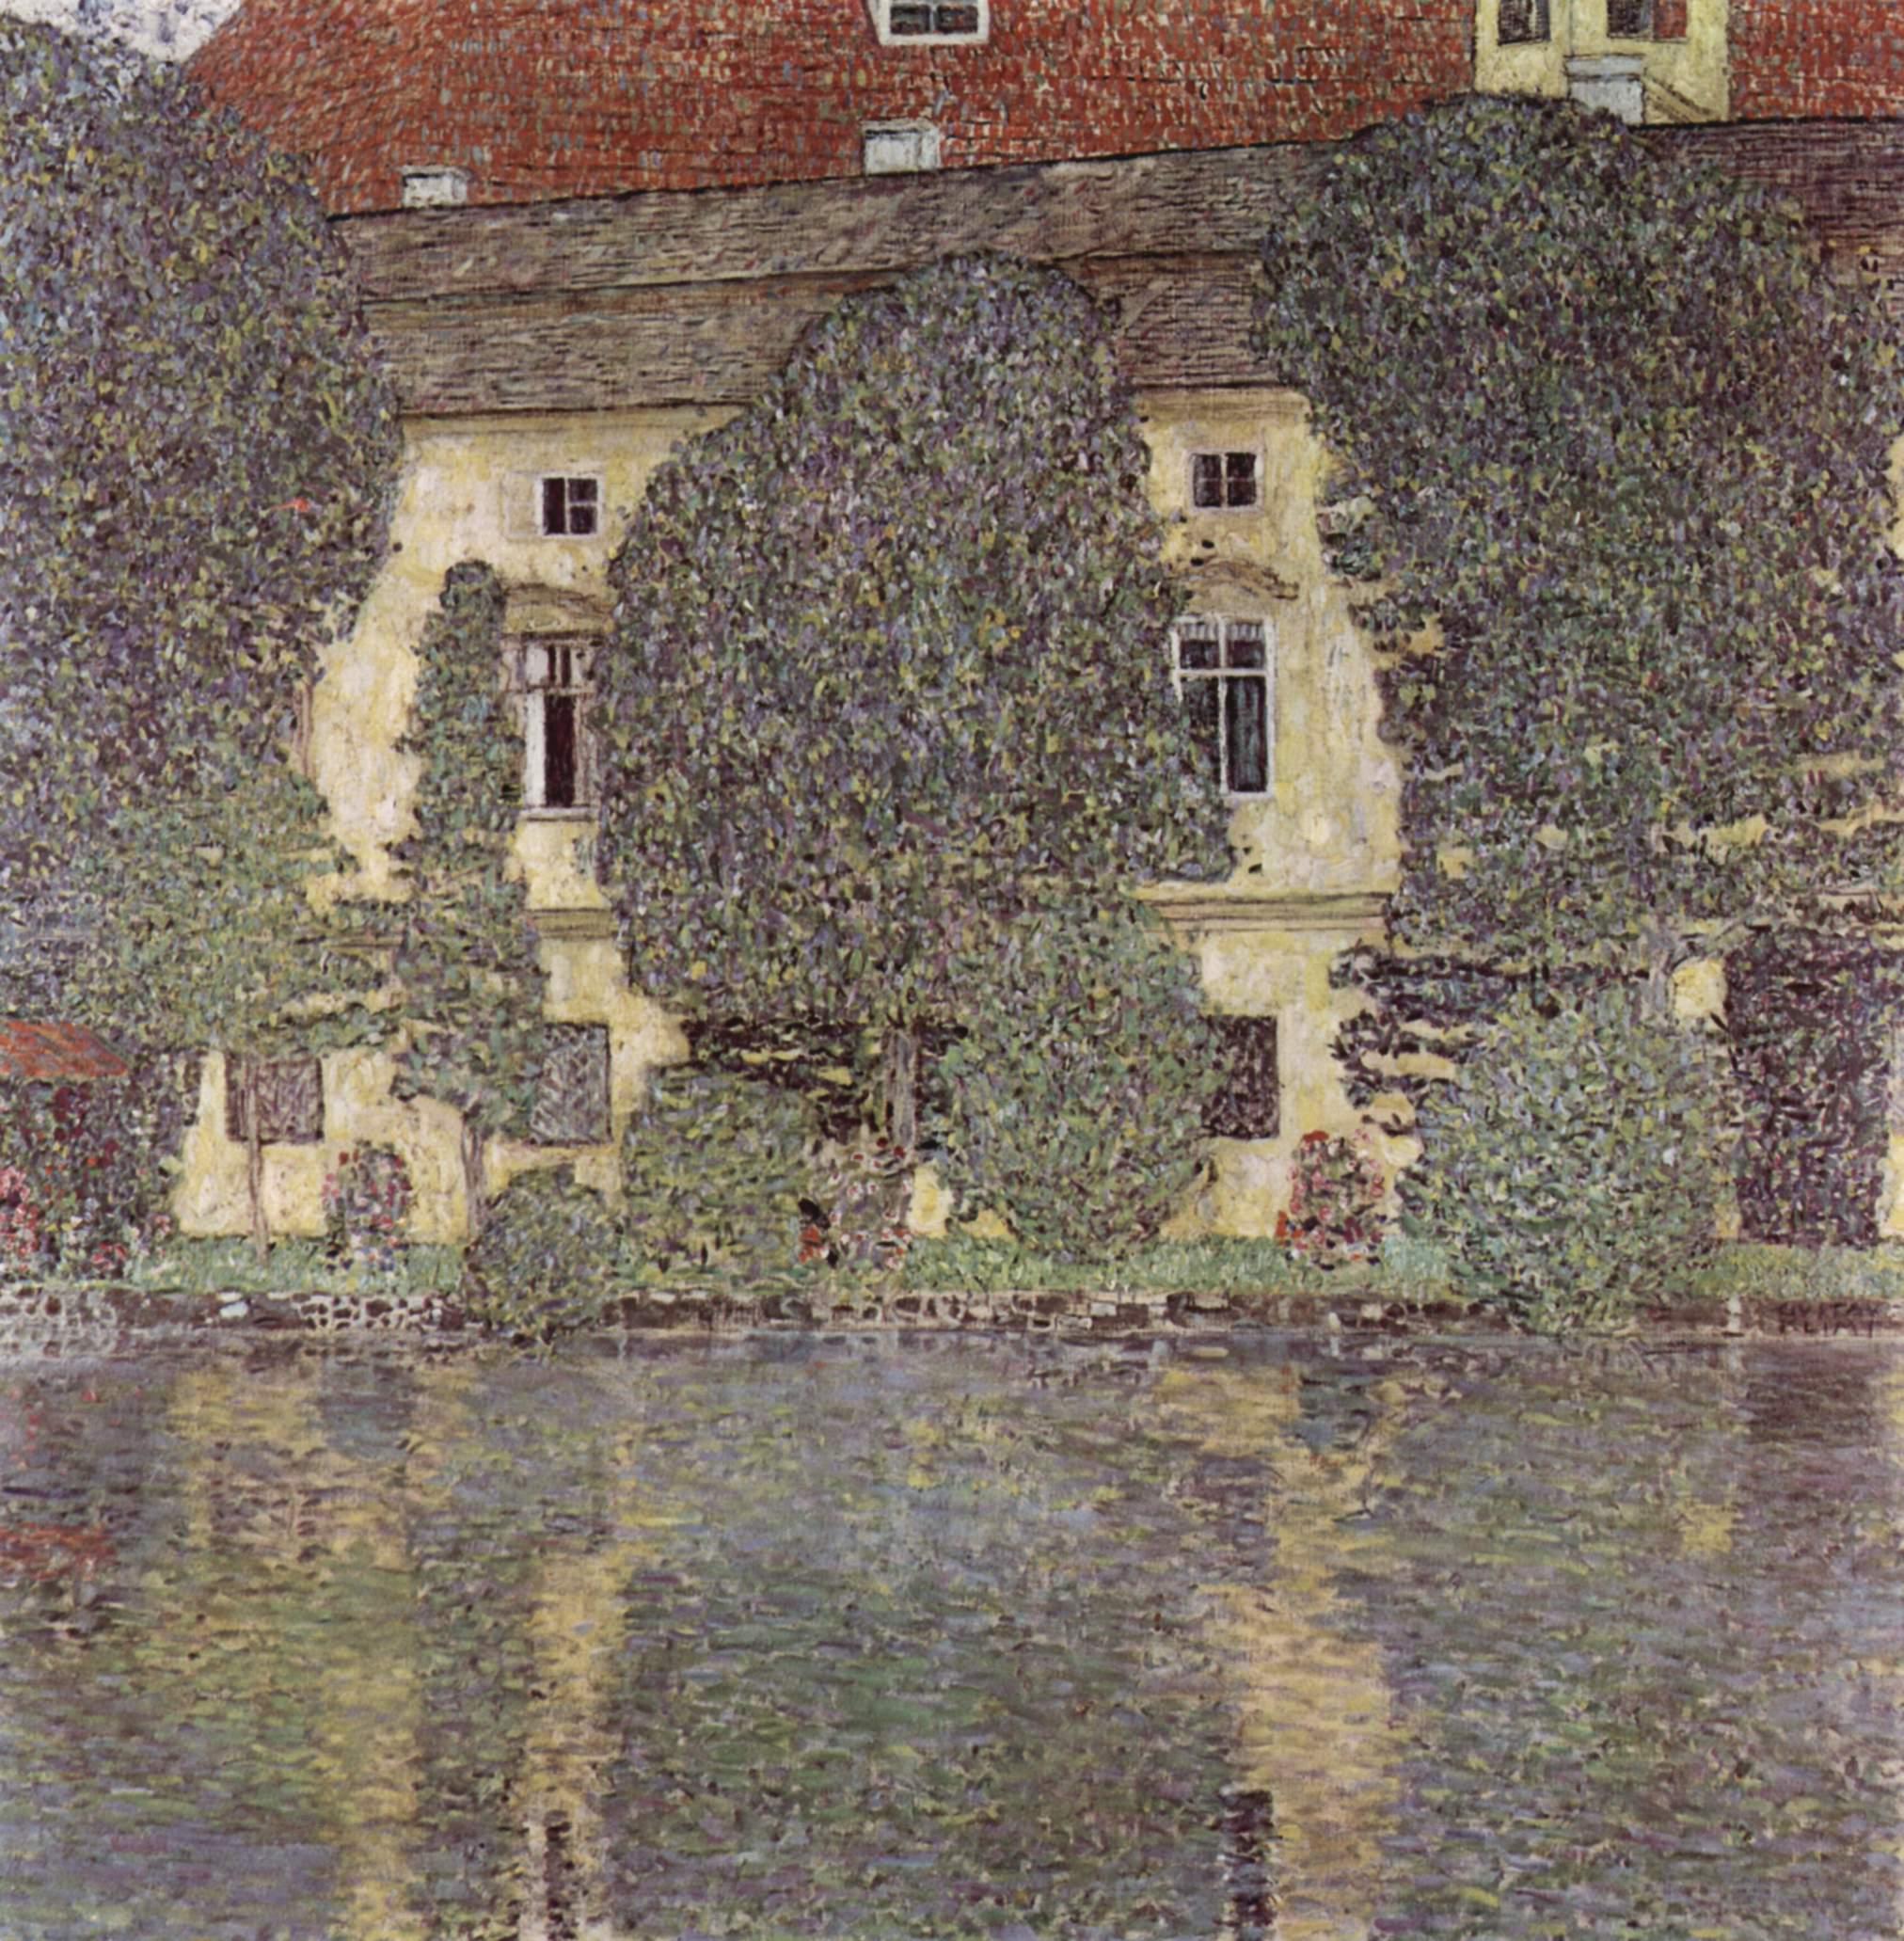 Замок Каммер на Аттерзе, Климт Густав